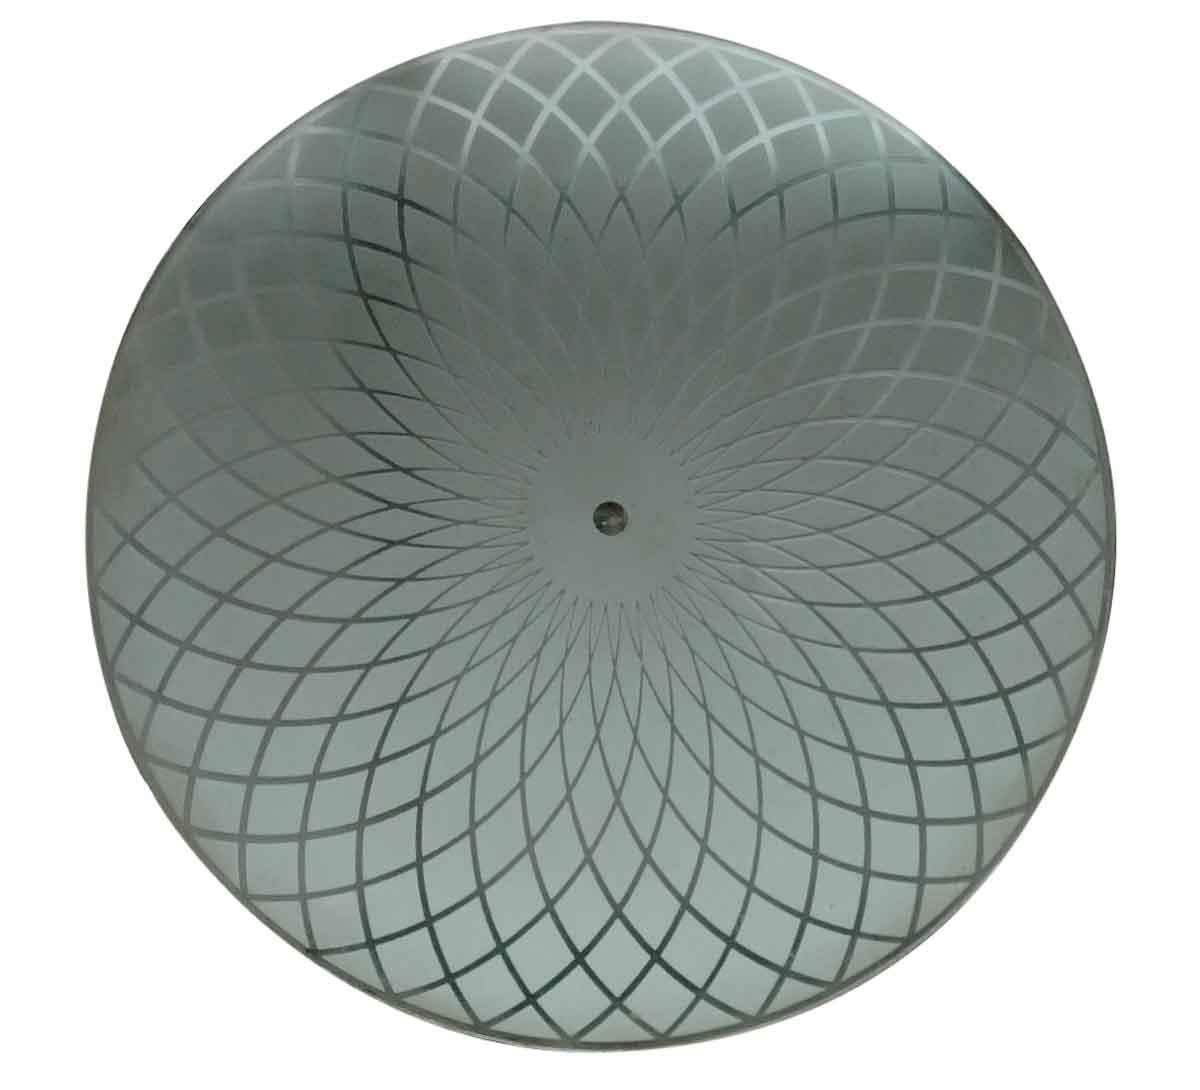 Art Deco Dish Light Fixture Glass